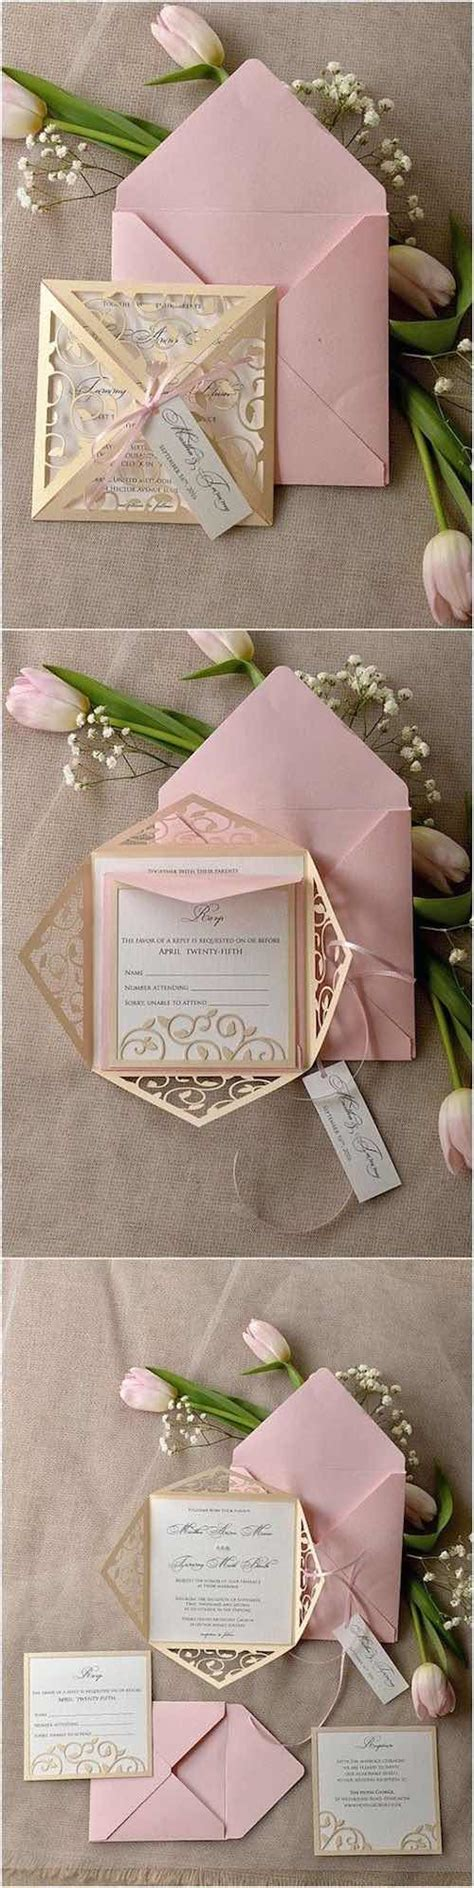 pink wedding invitations the fairytale wedding ideas to plan your disney themed wedding